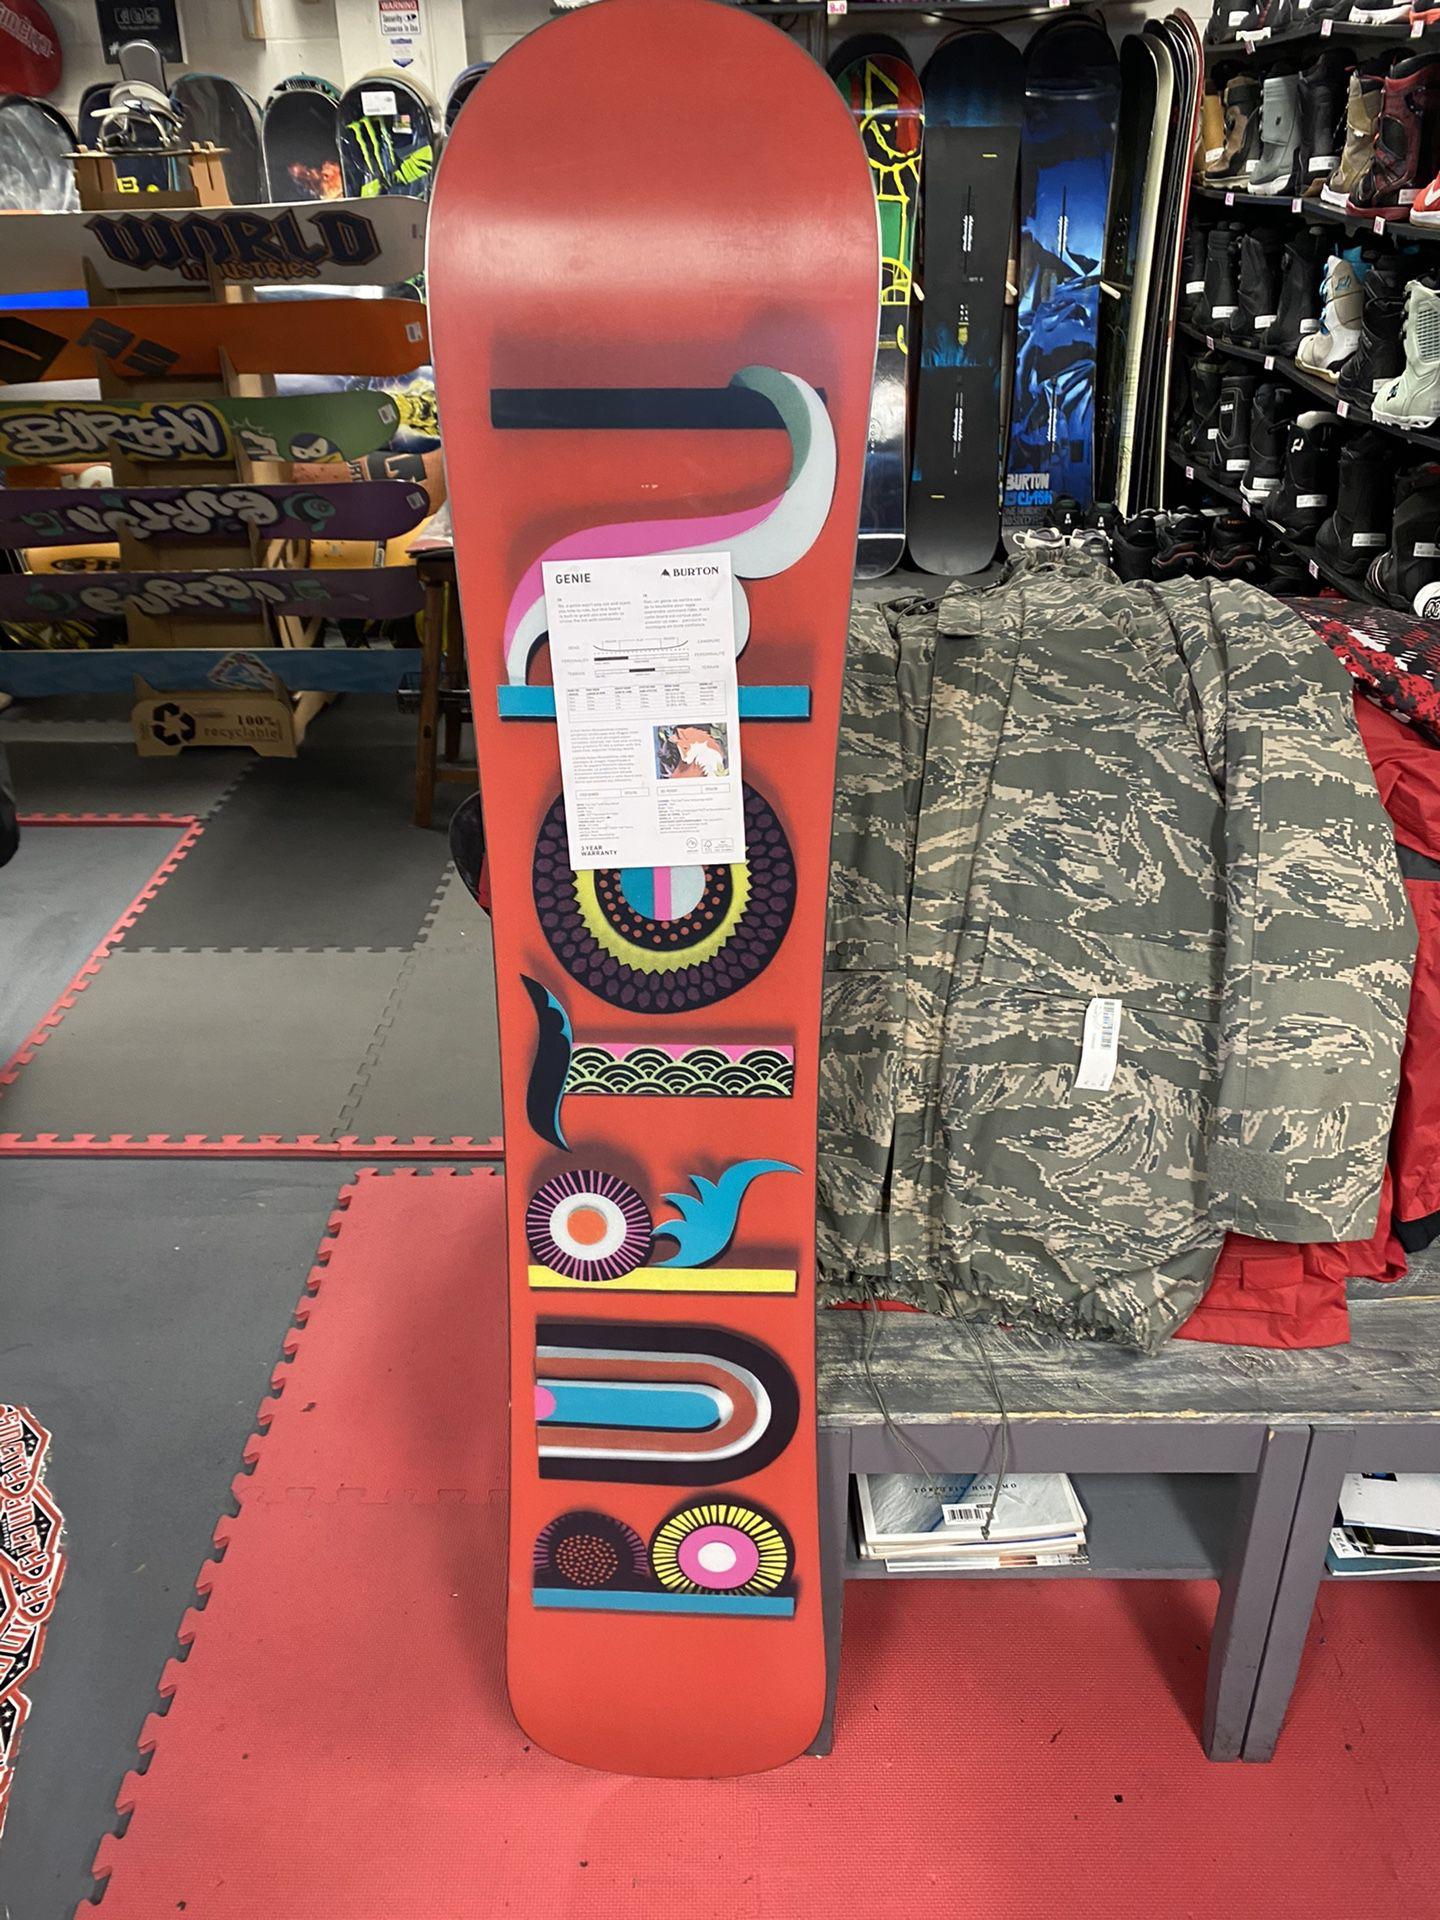 new burton 151 snowboard with 3 year warranty